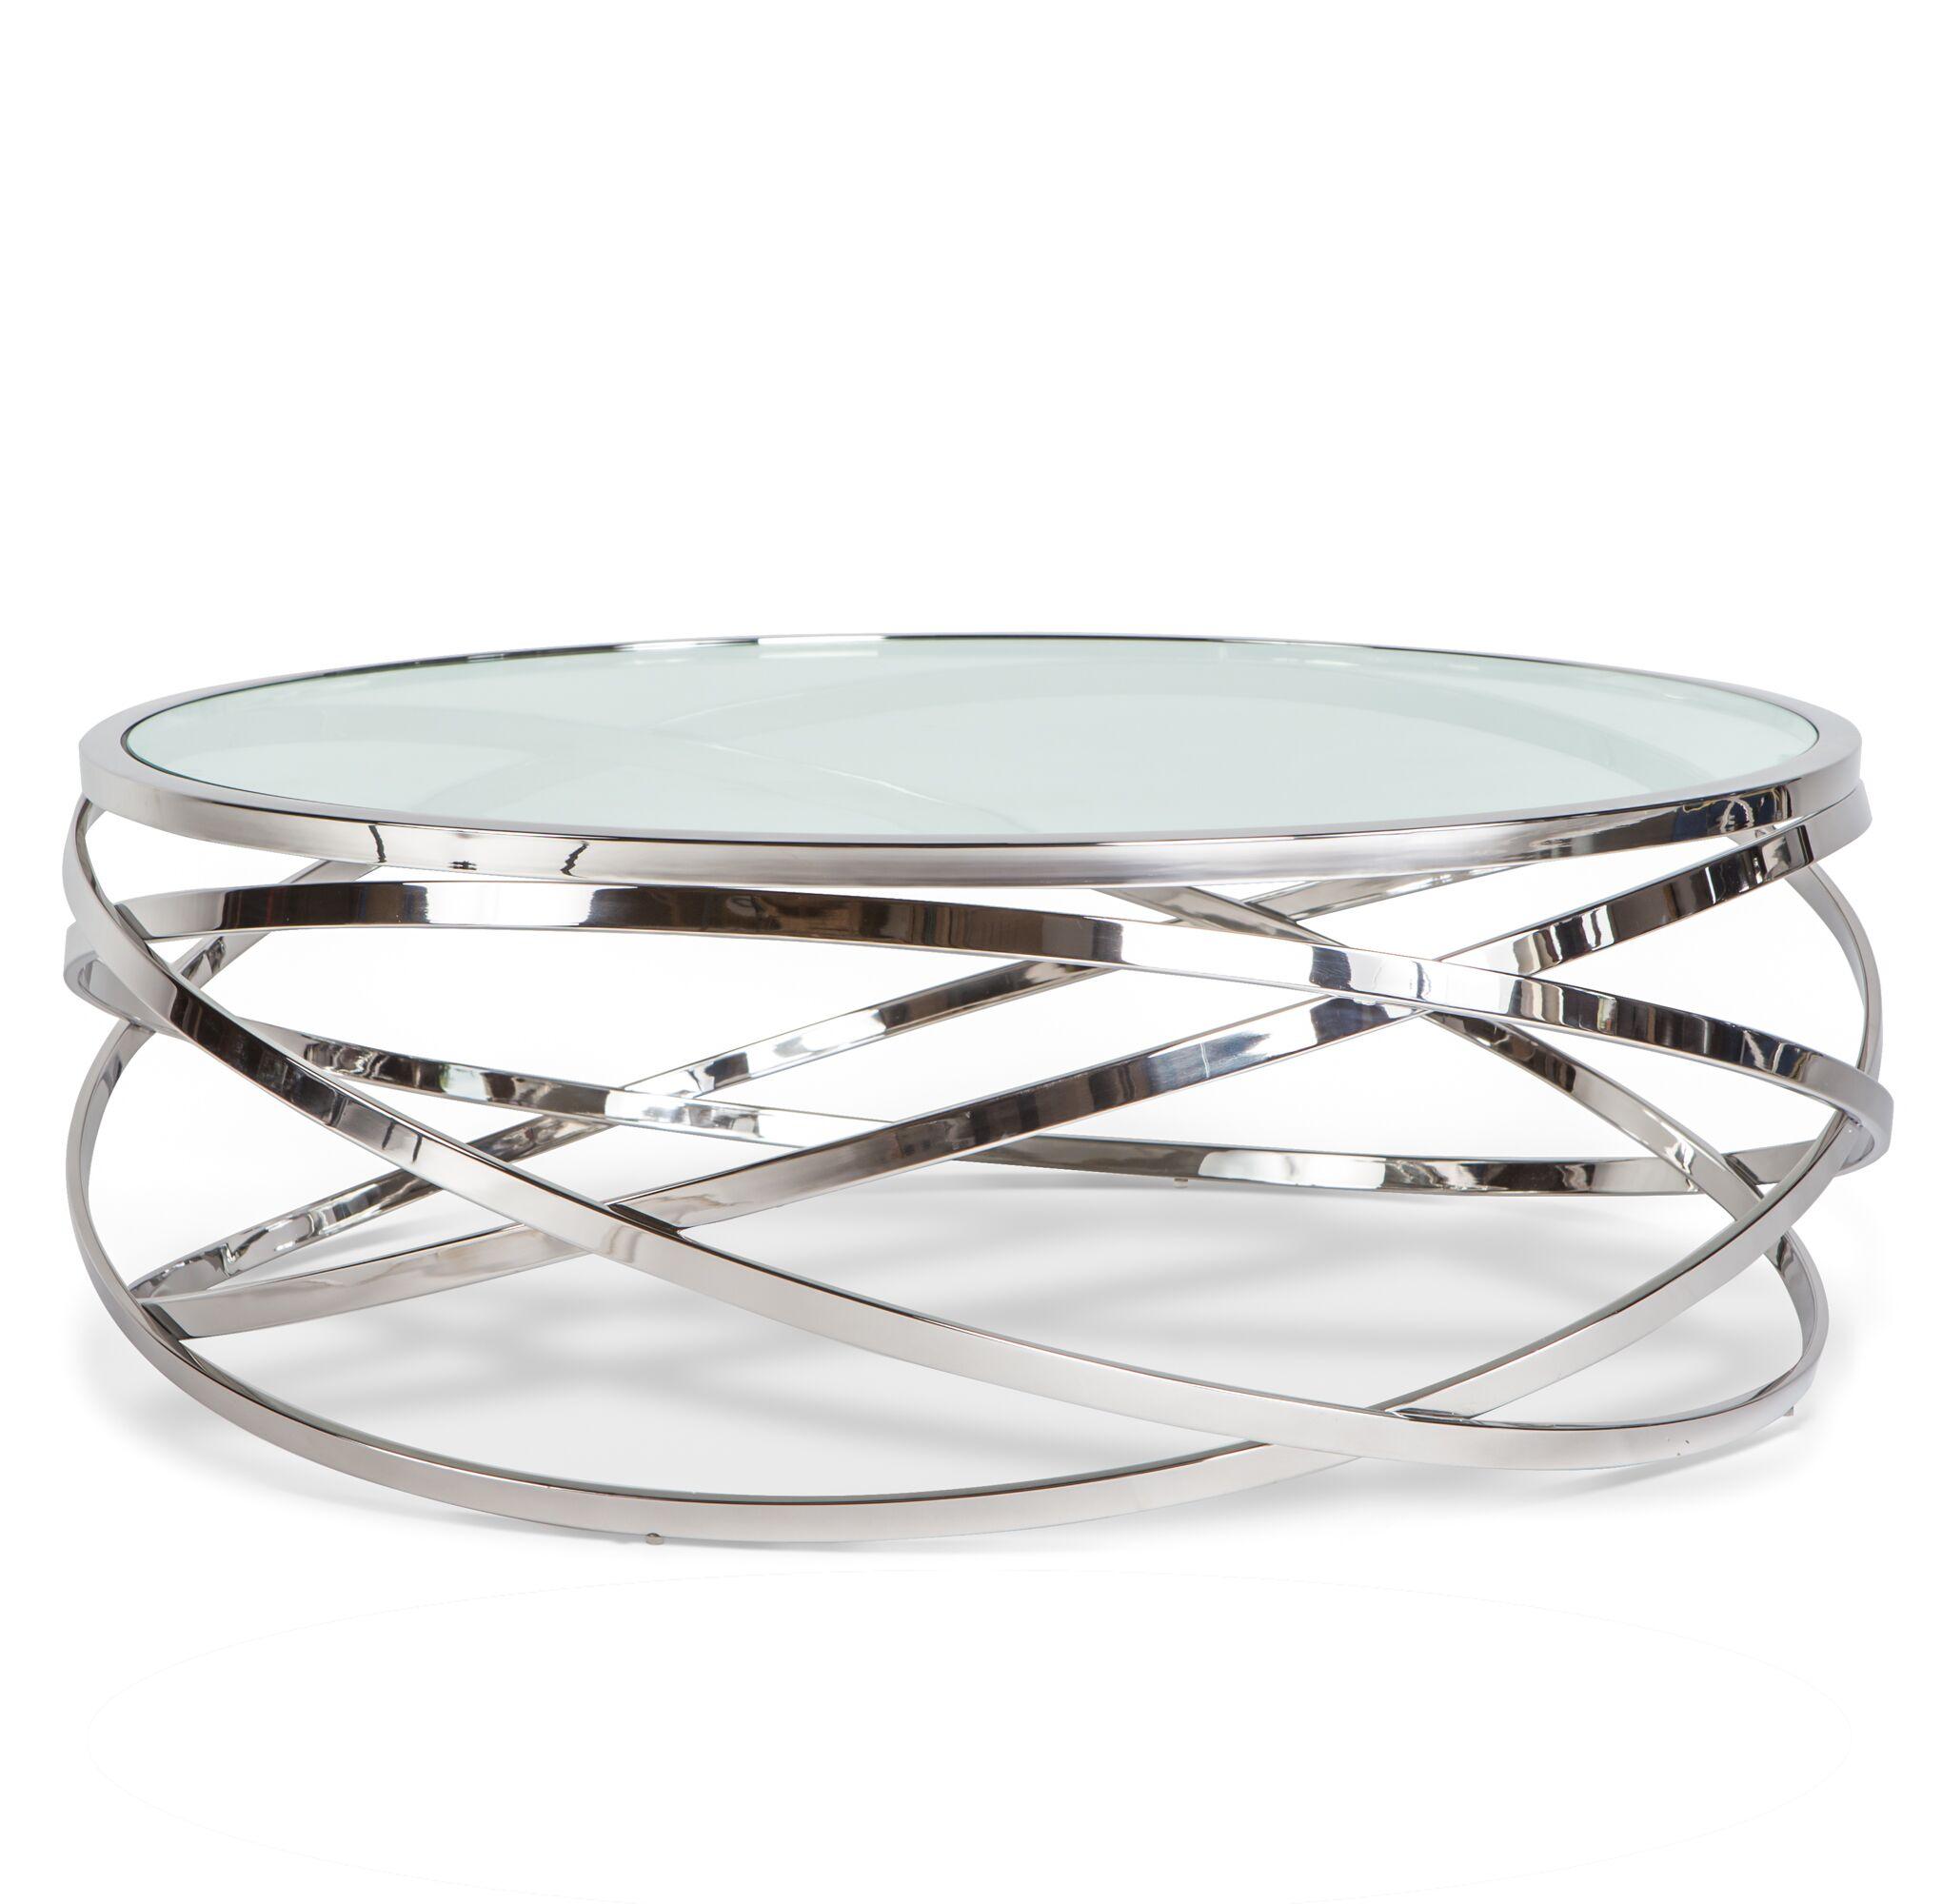 Kayleigh Coffee Table